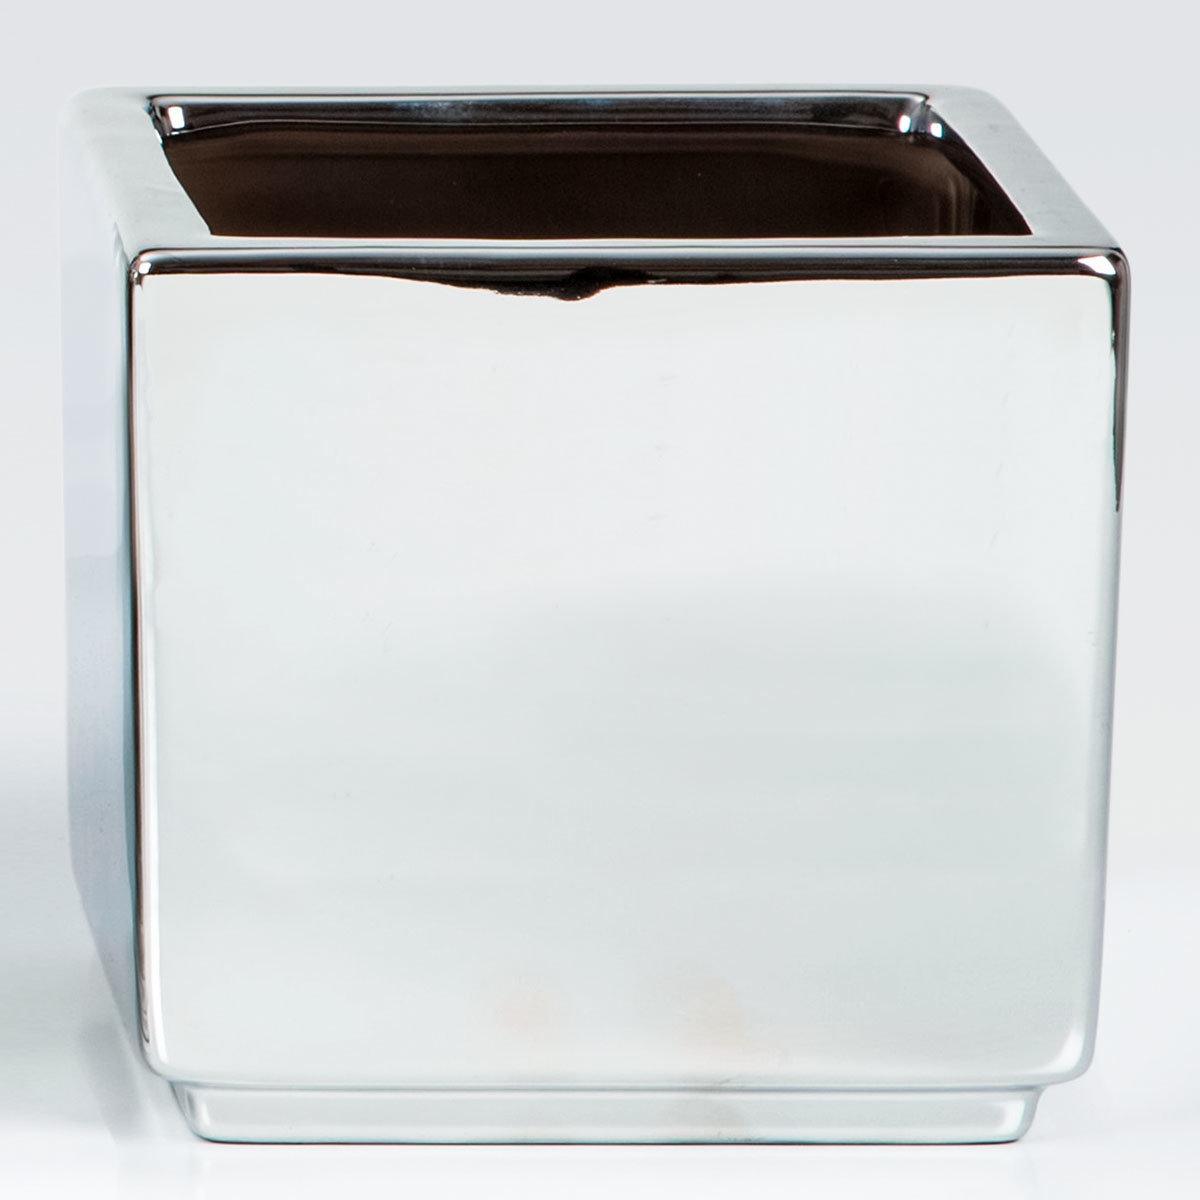 Übertopf Mirror Silver, 15 cm, Silber